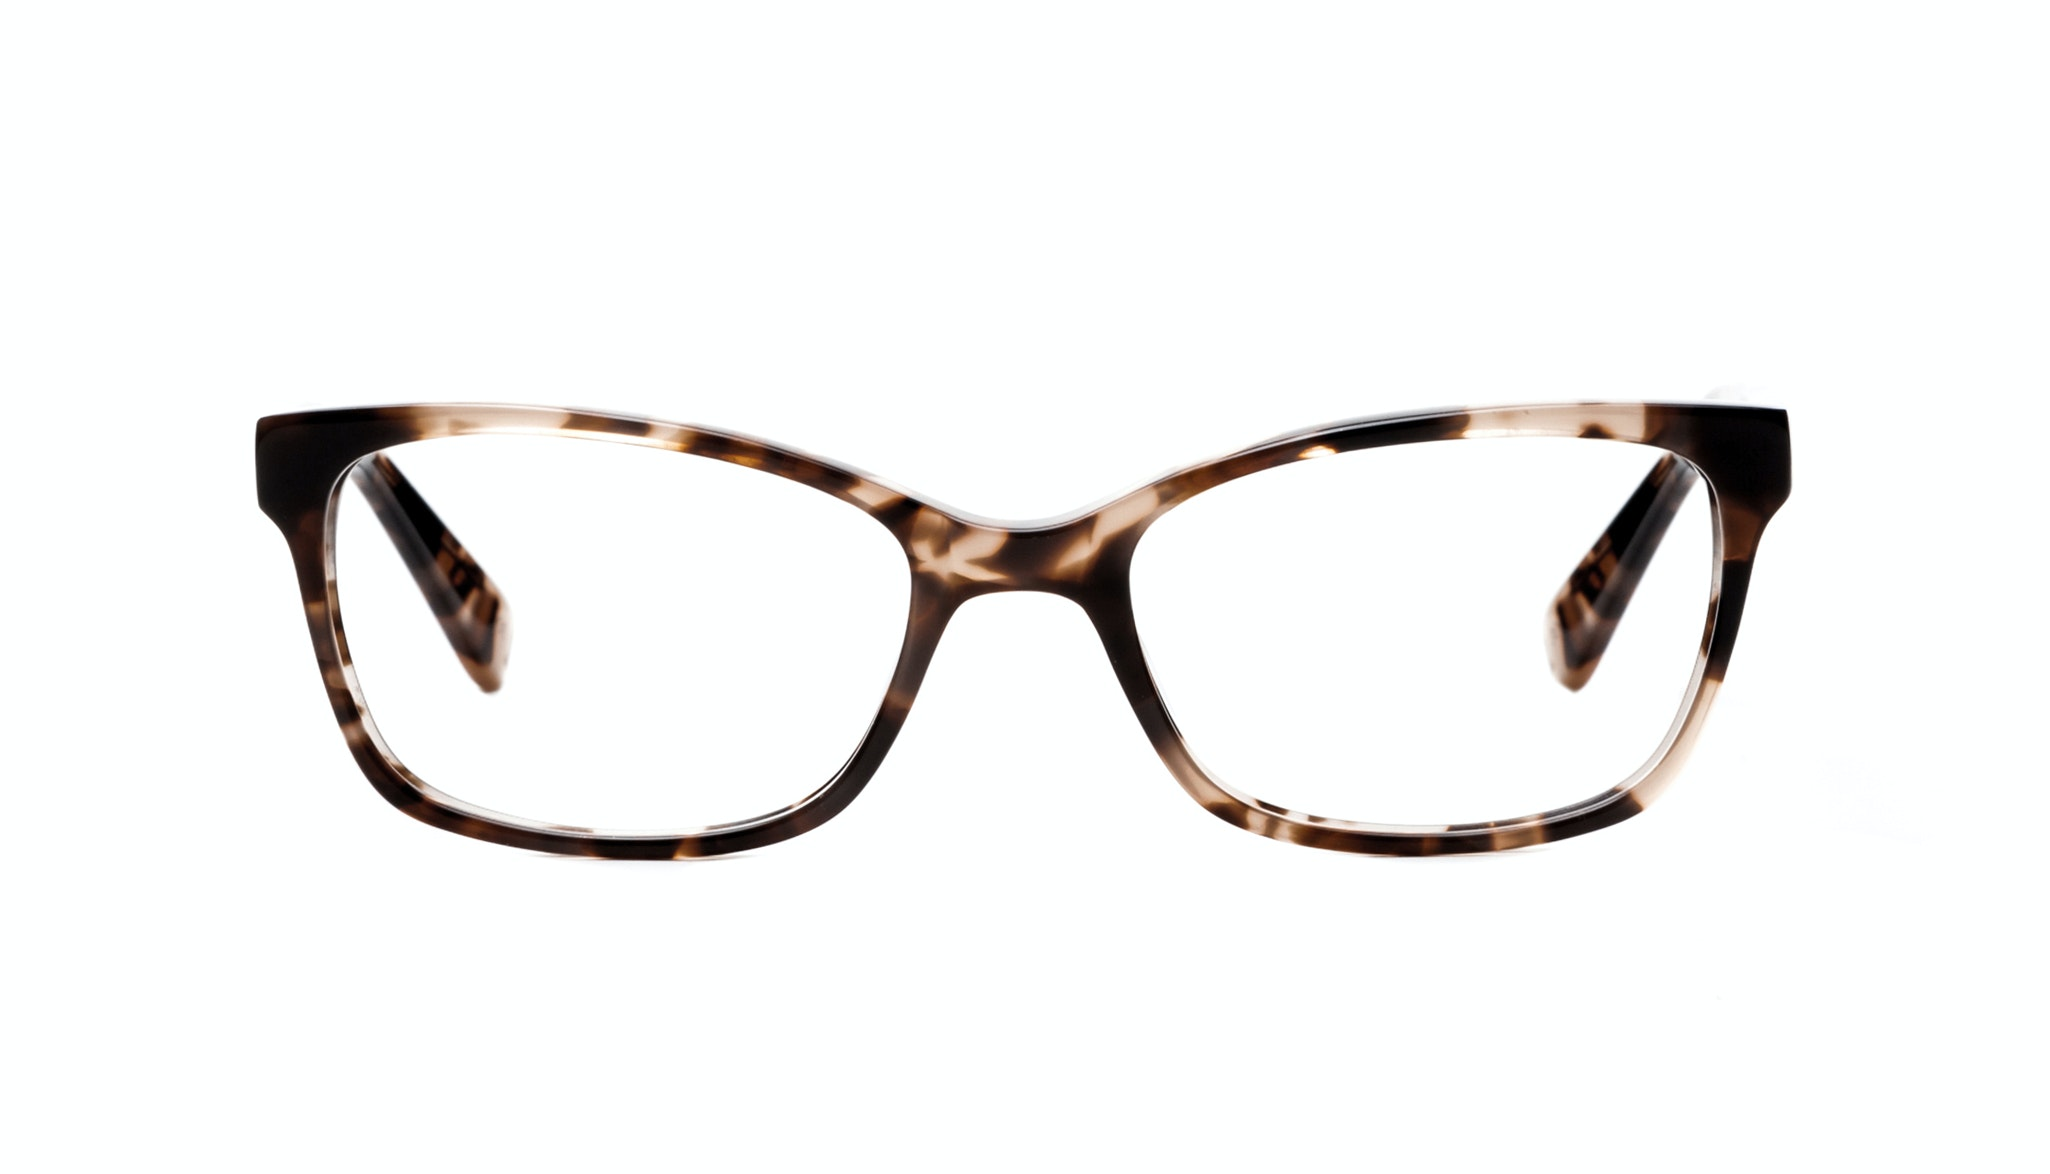 Affordable Fashion Glasses Cat Eye Rectangle Eyeglasses Women Comet Pink Tortoise Front